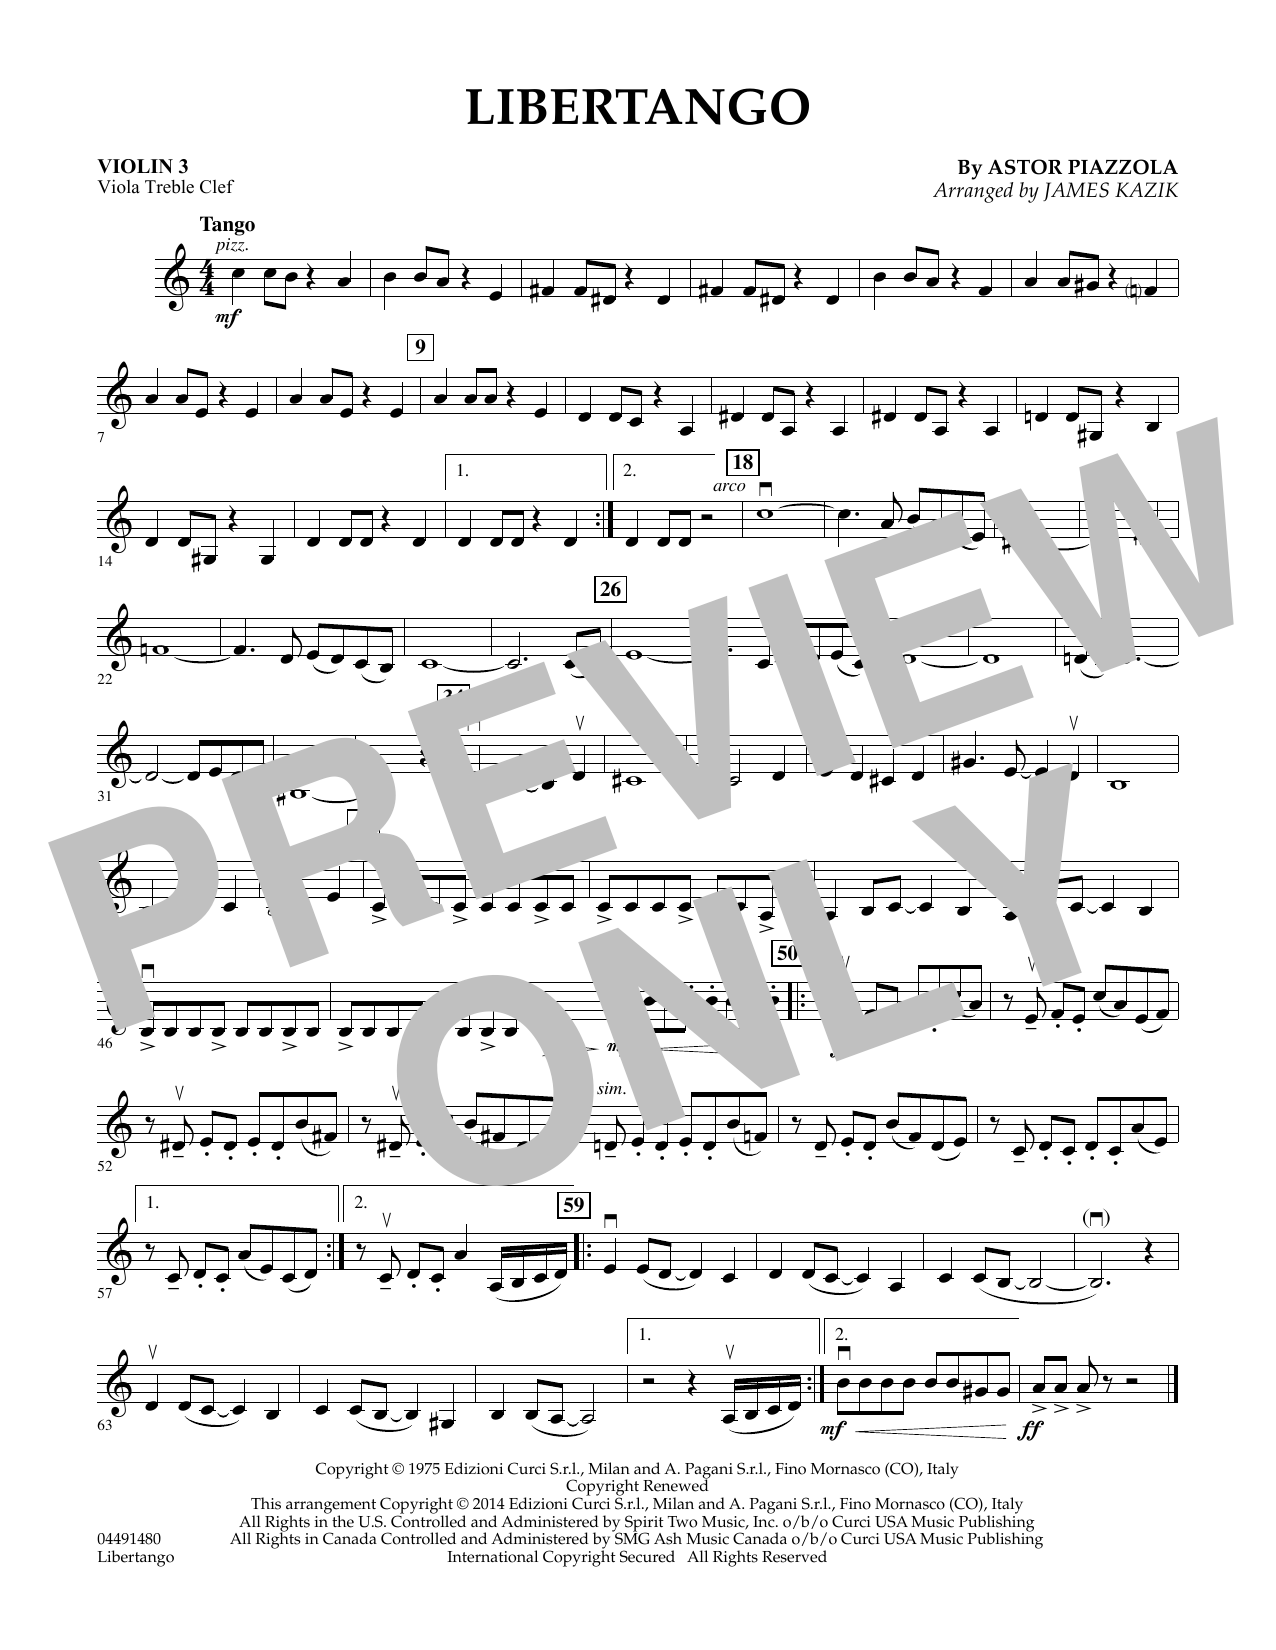 Libertango - Violin 3 (Viola Treble Clef) (Orchestra)